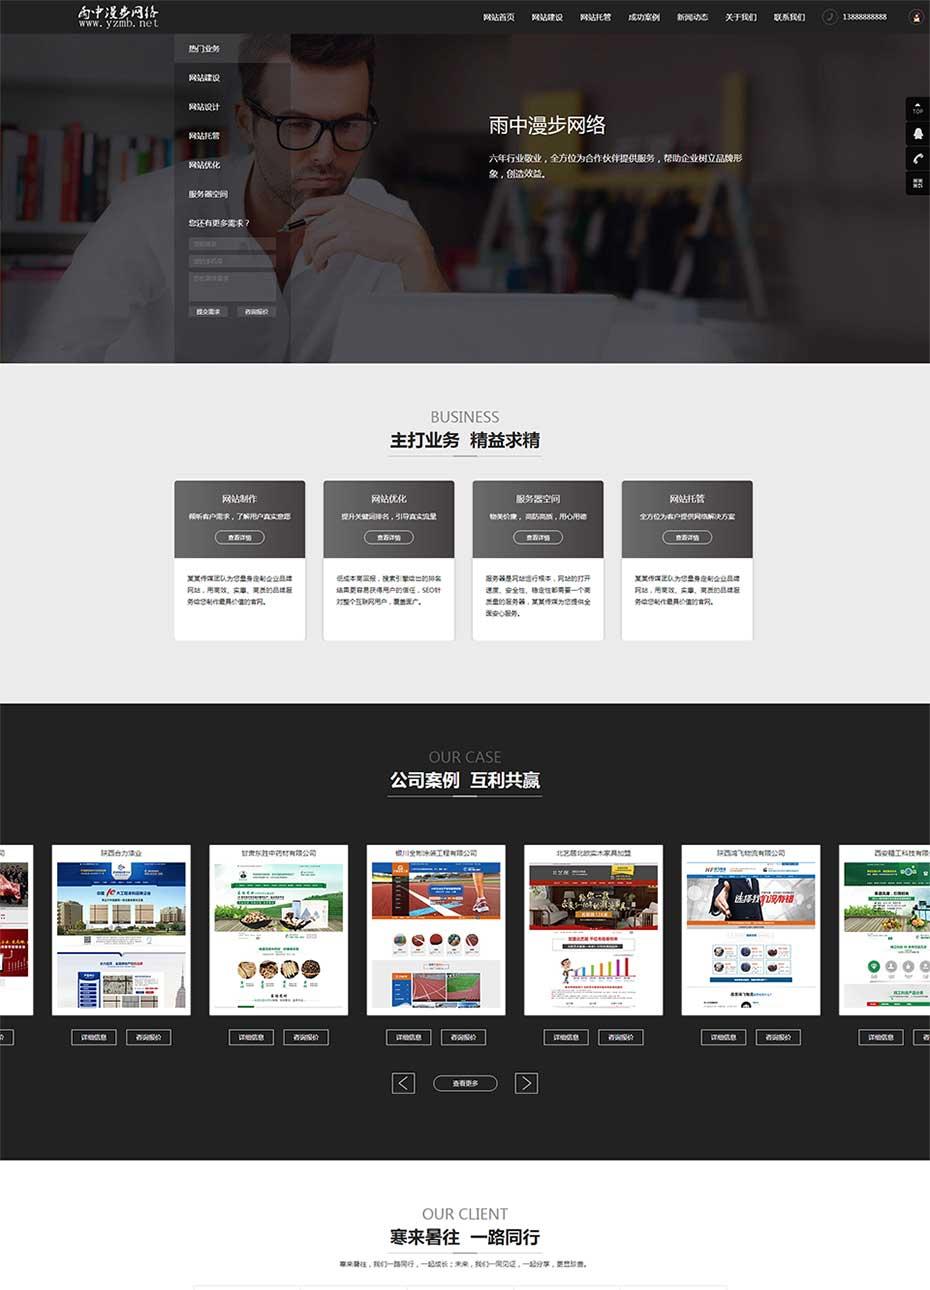 dede主题模板-网站建站优化推广软件公司类网站织梦模板-(带手机版数据同步) 第2张